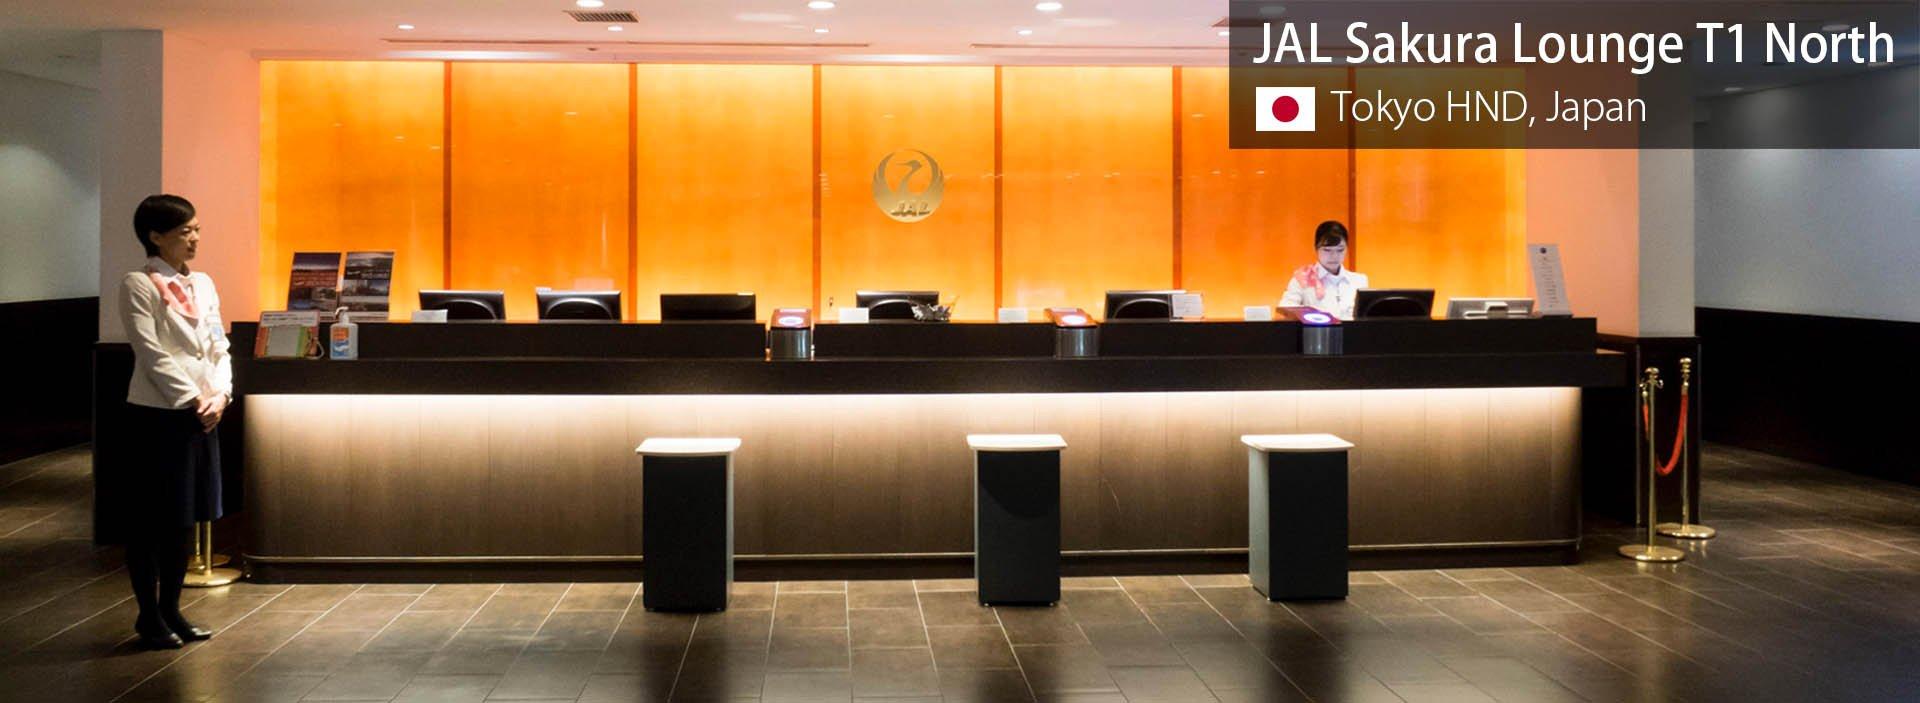 Review: JAL Sakura Lounge Domestic Terminal 1 North at Tokyo Haneda